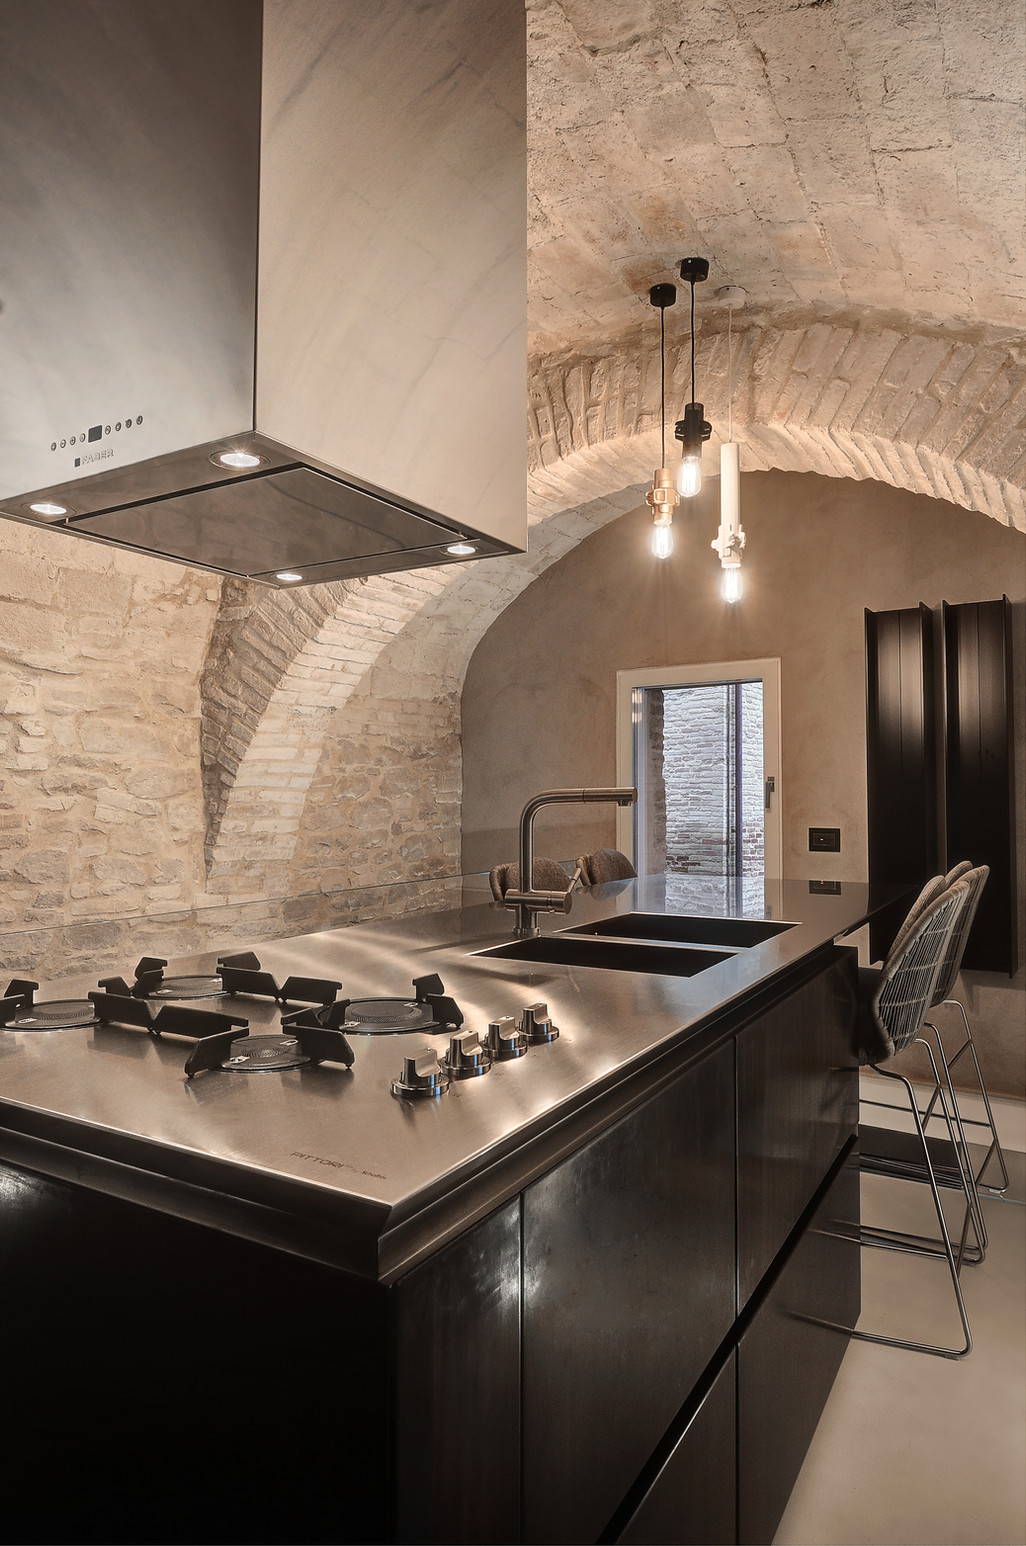 gp house-cucina1.jpg